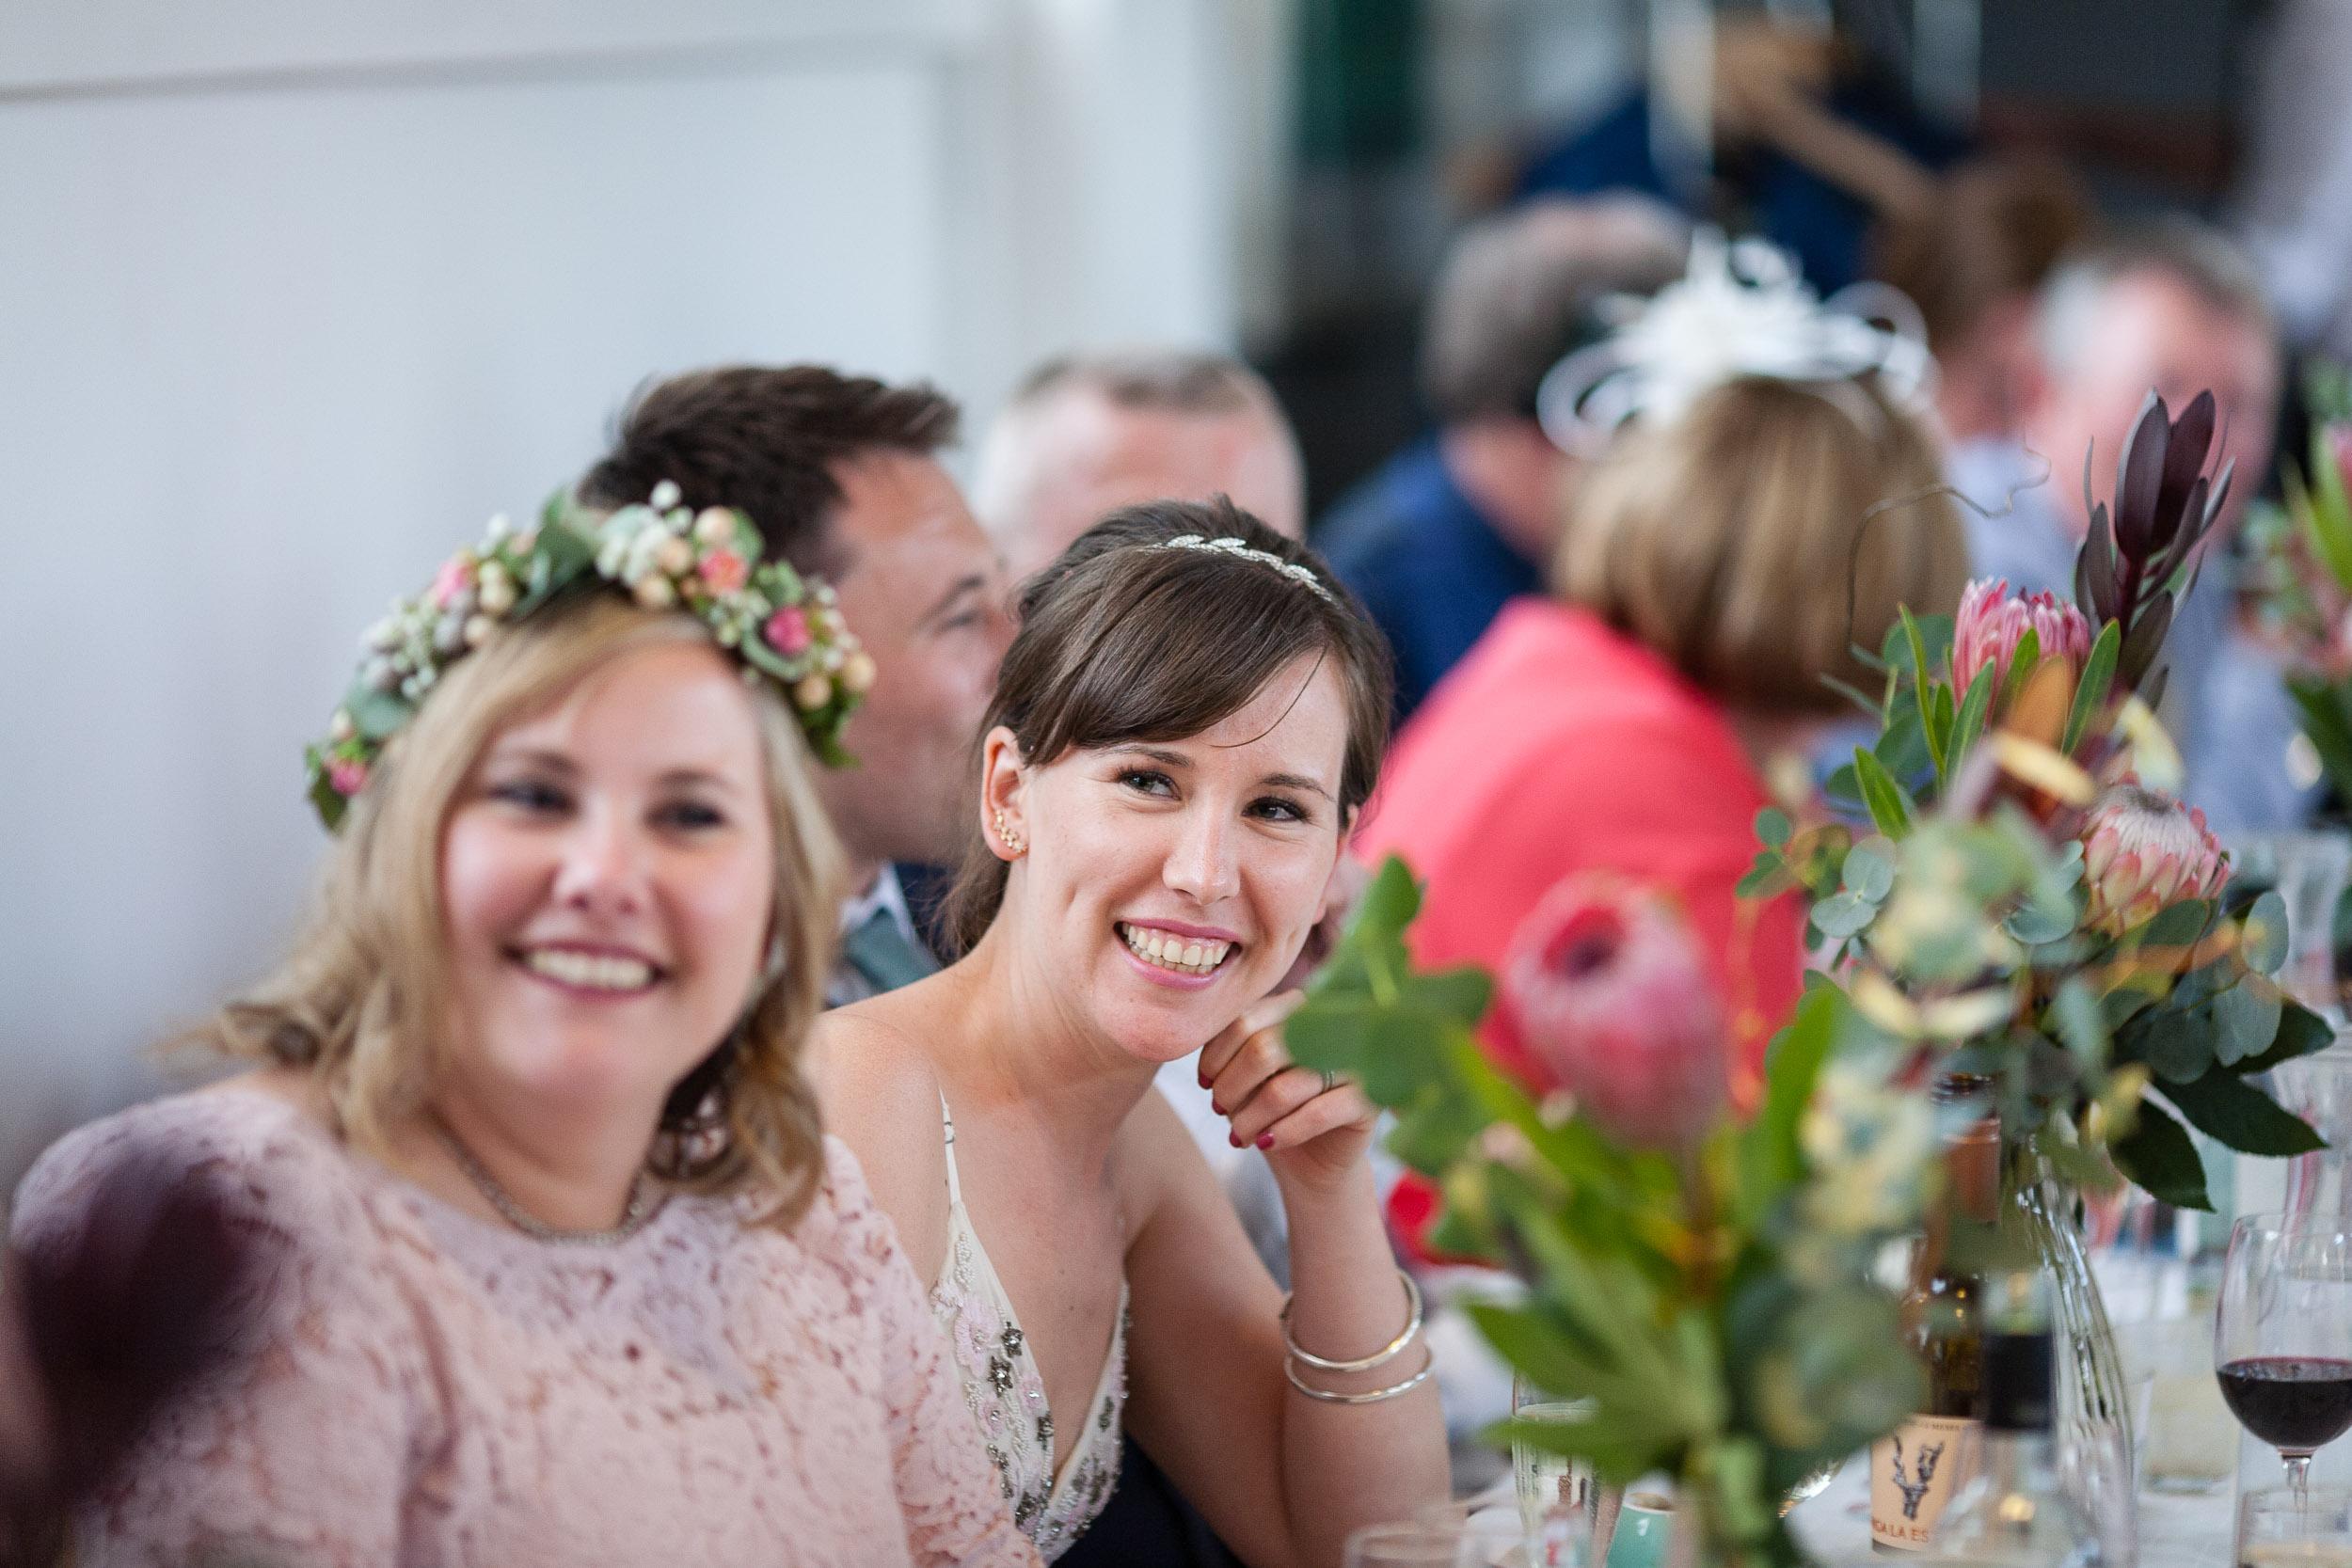 brockwell-lido-brixton-herne-hill-wedding-322.jpg